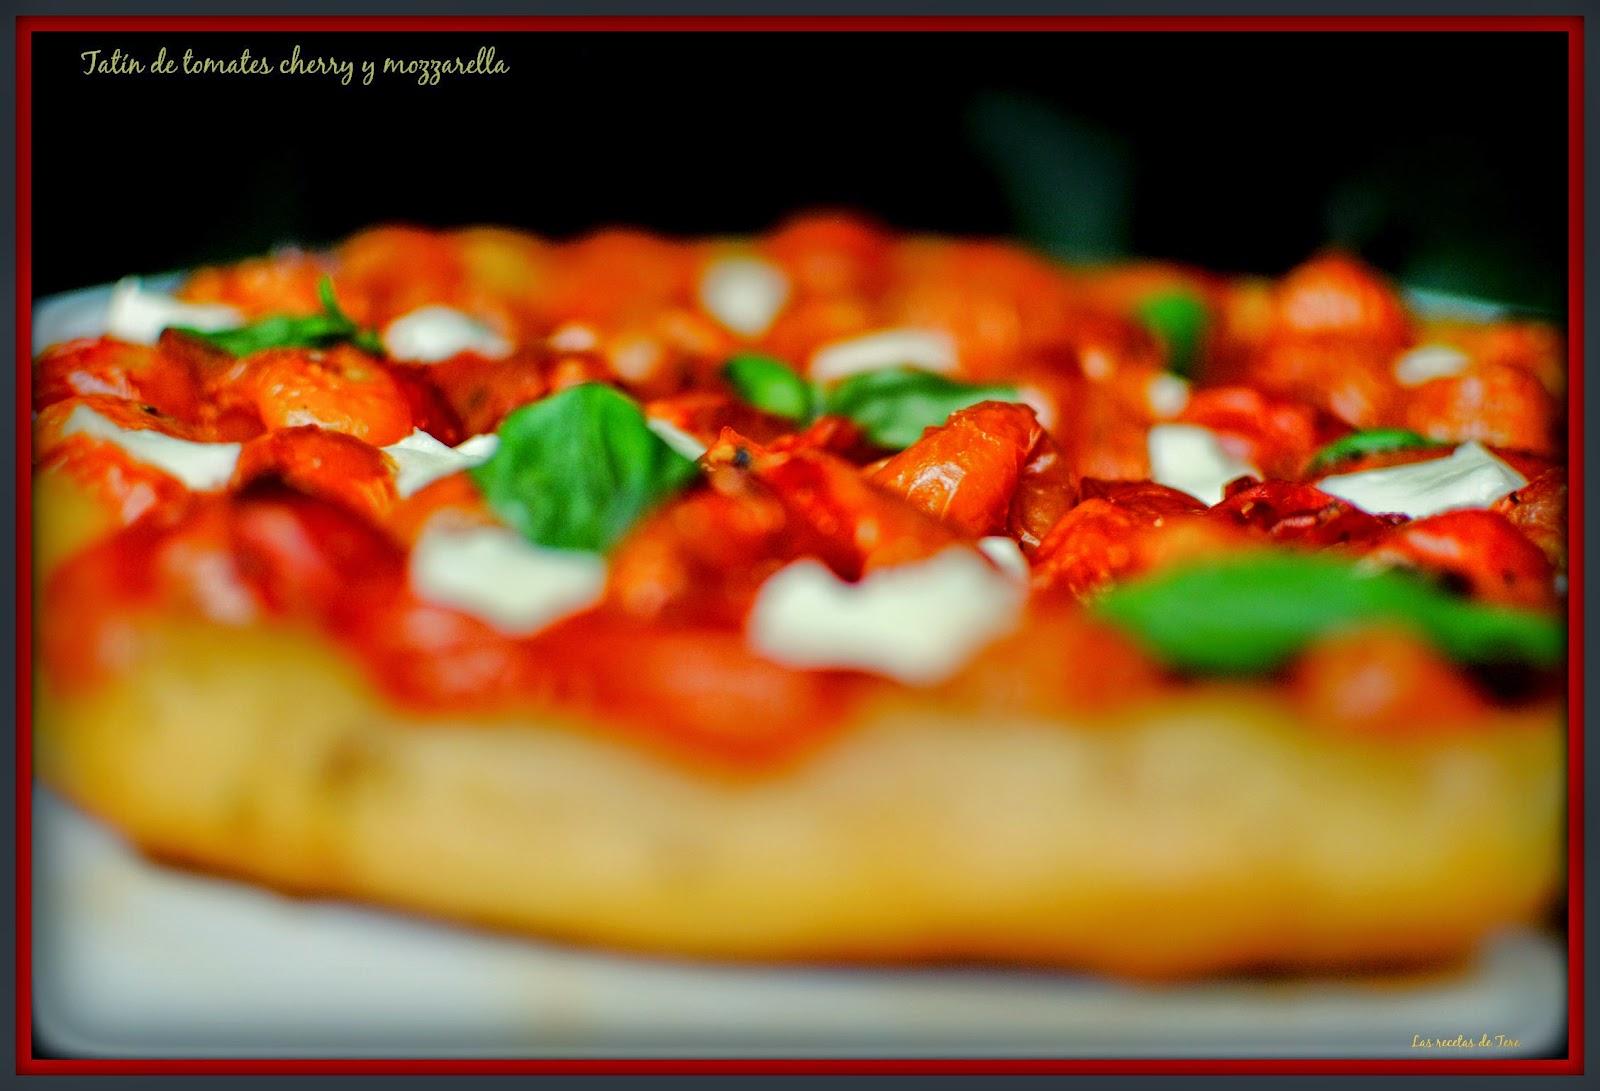 tatín de tomates cherry y mozzarella tererecetas 03